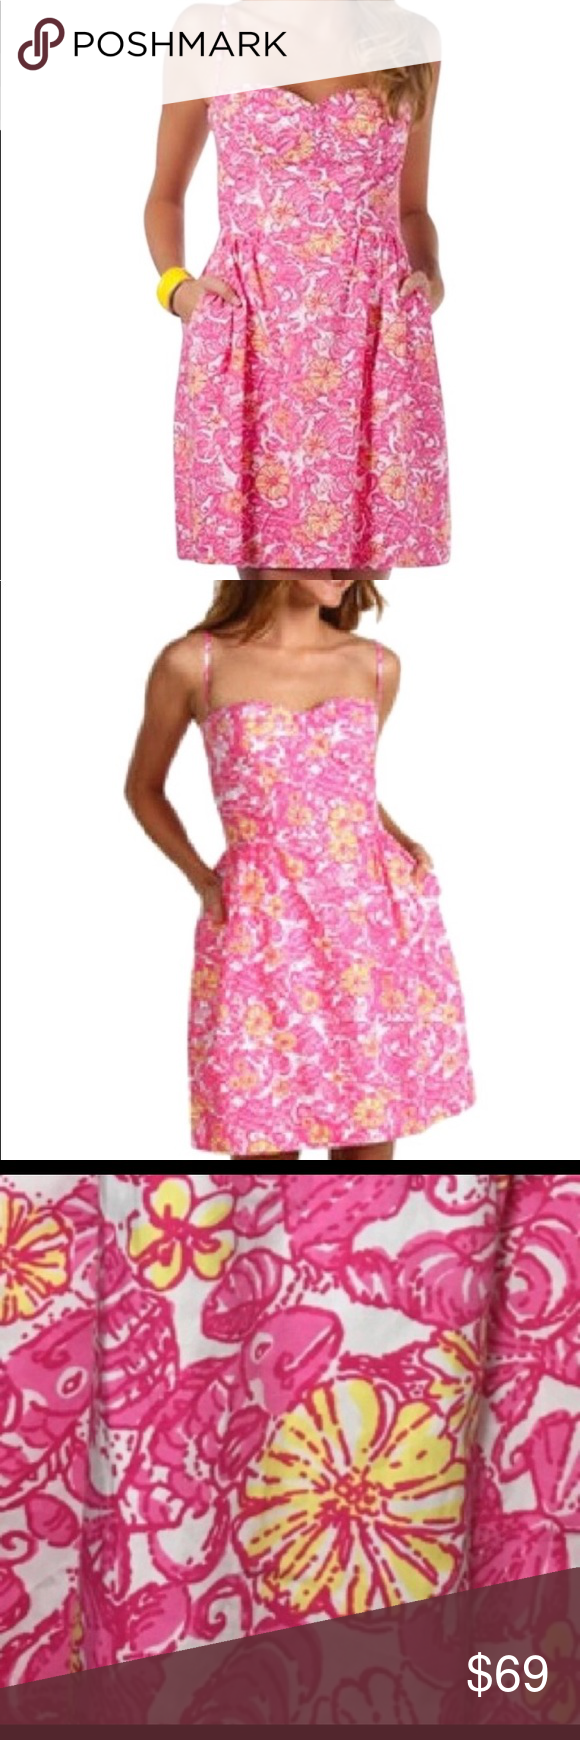 d11a7d7194e62a Lilly Pulitzer Chum Bucket Georgie Dress Sleeveless dress in printed cotton  poplin Bustier-style bodice